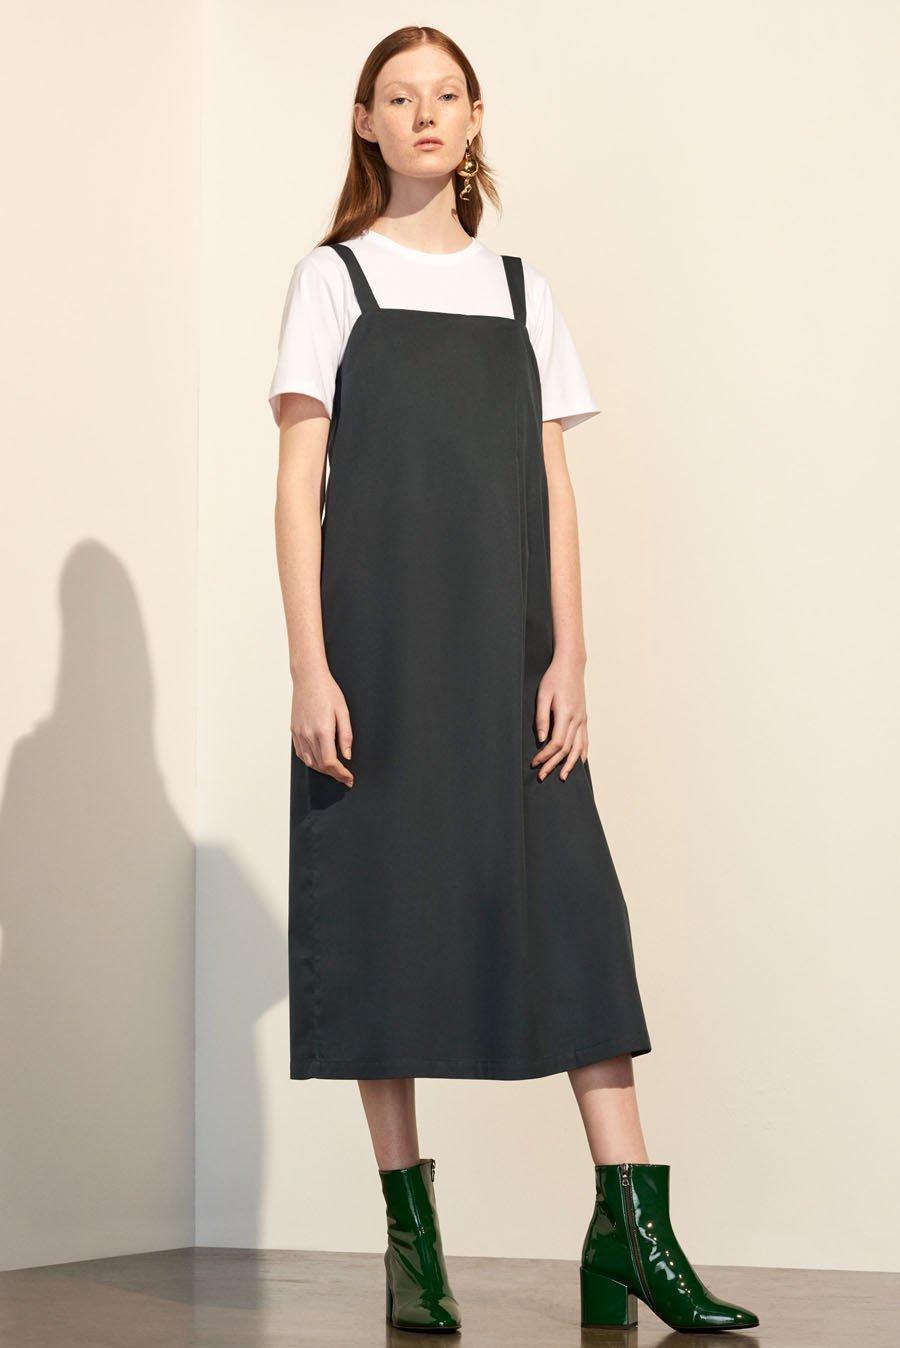 Shadow-dress_010_teal_lookbook_800x1200@2x.jpg